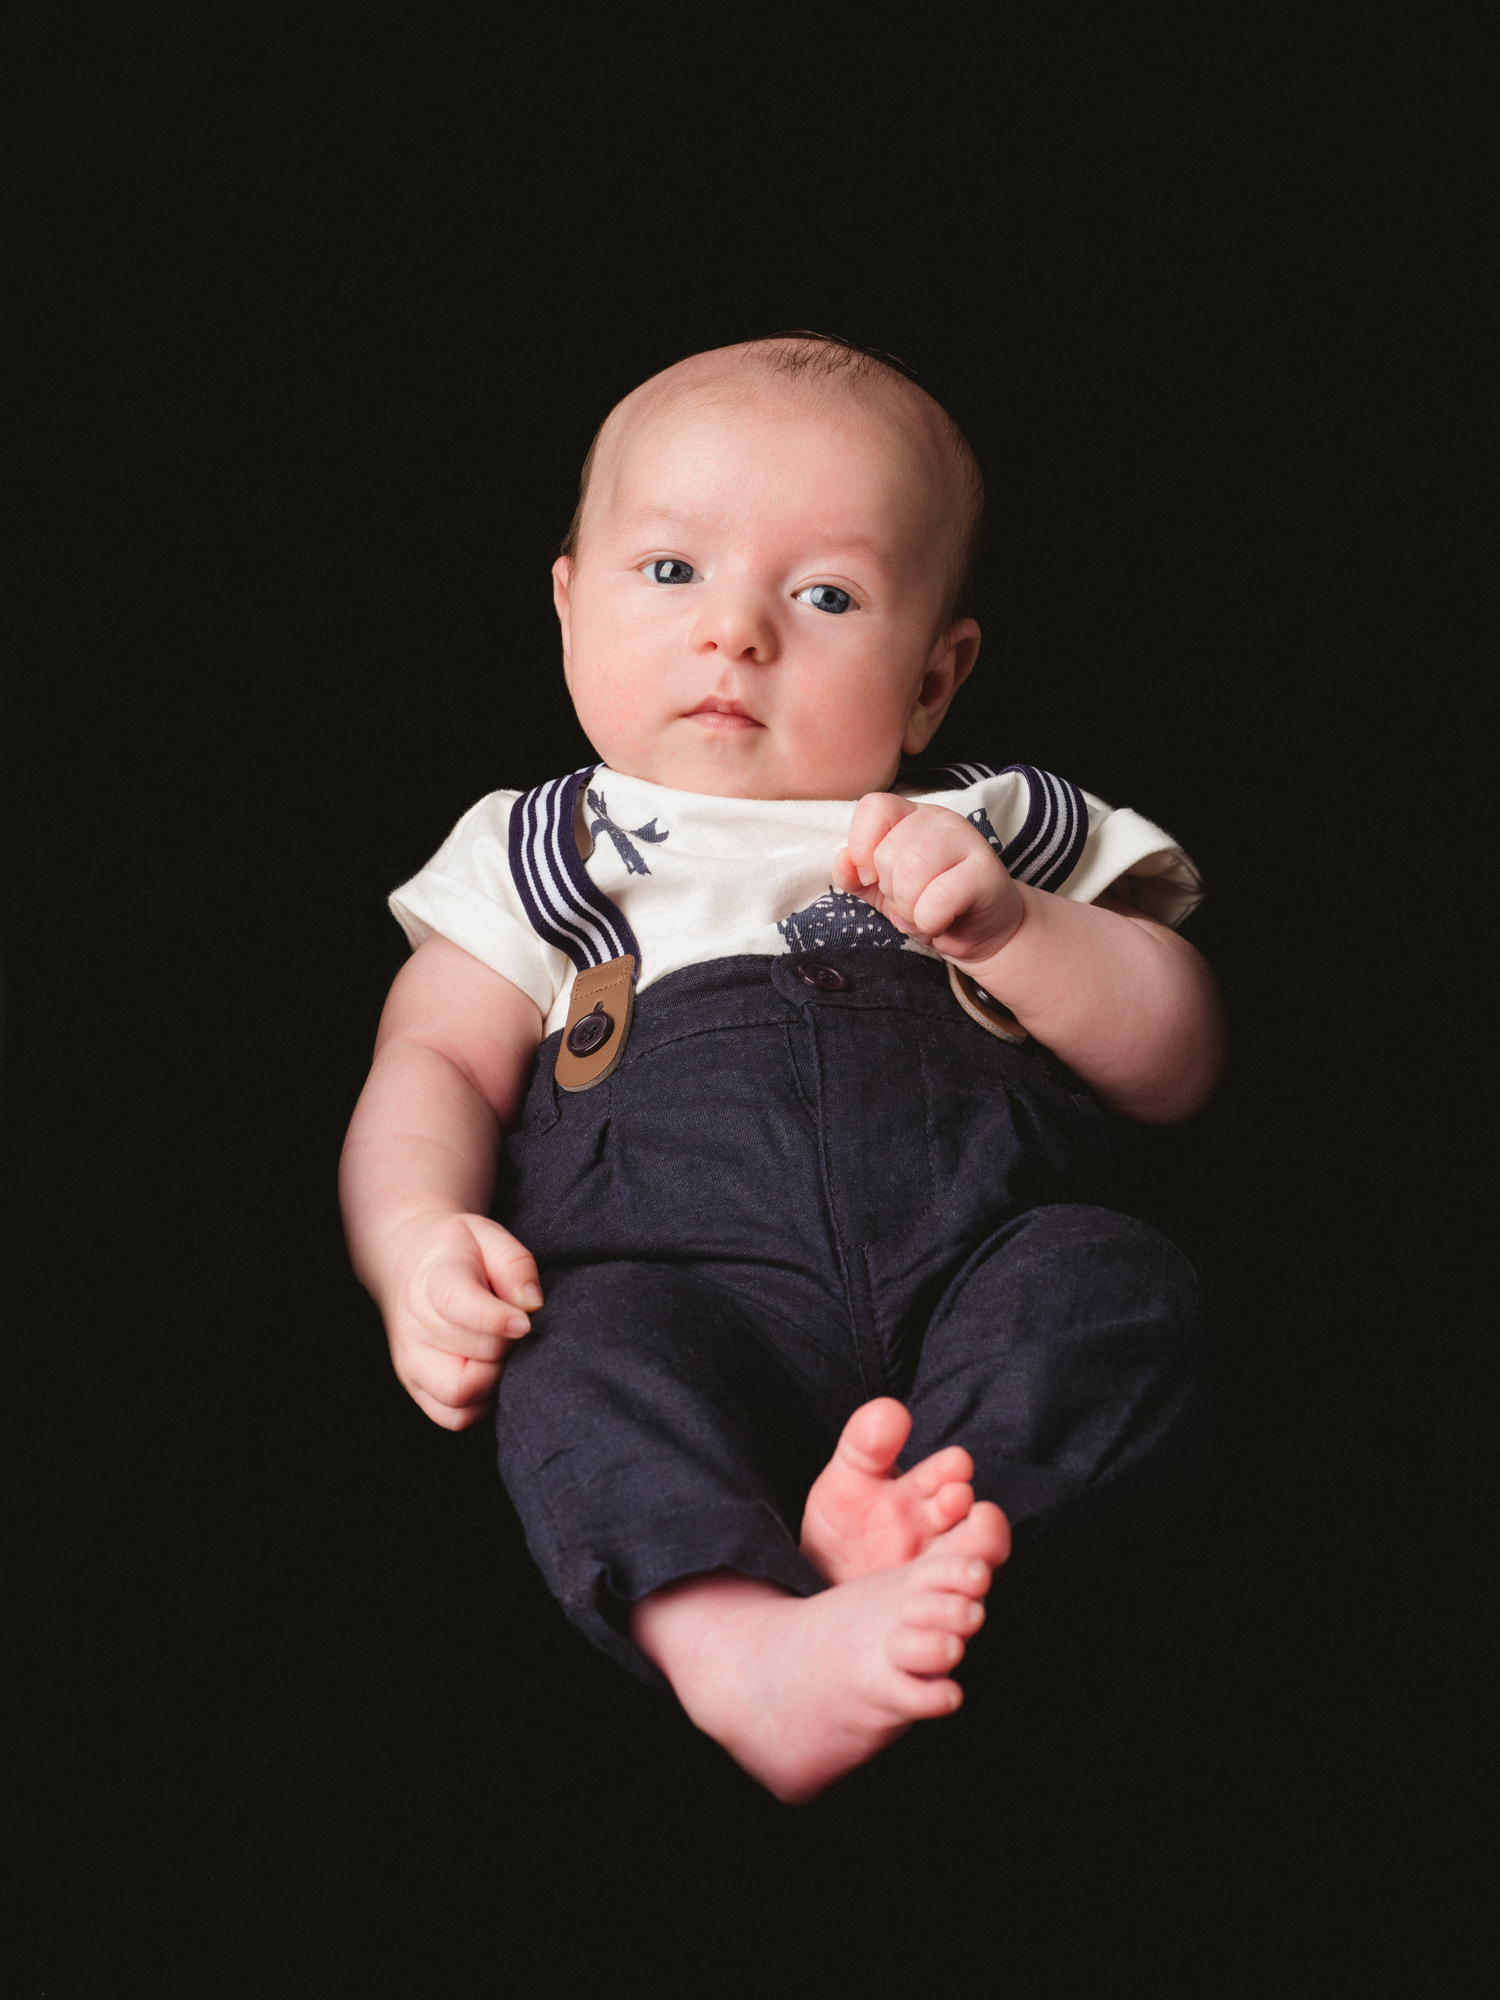 Newborn-baby-Arlo-004.jpg